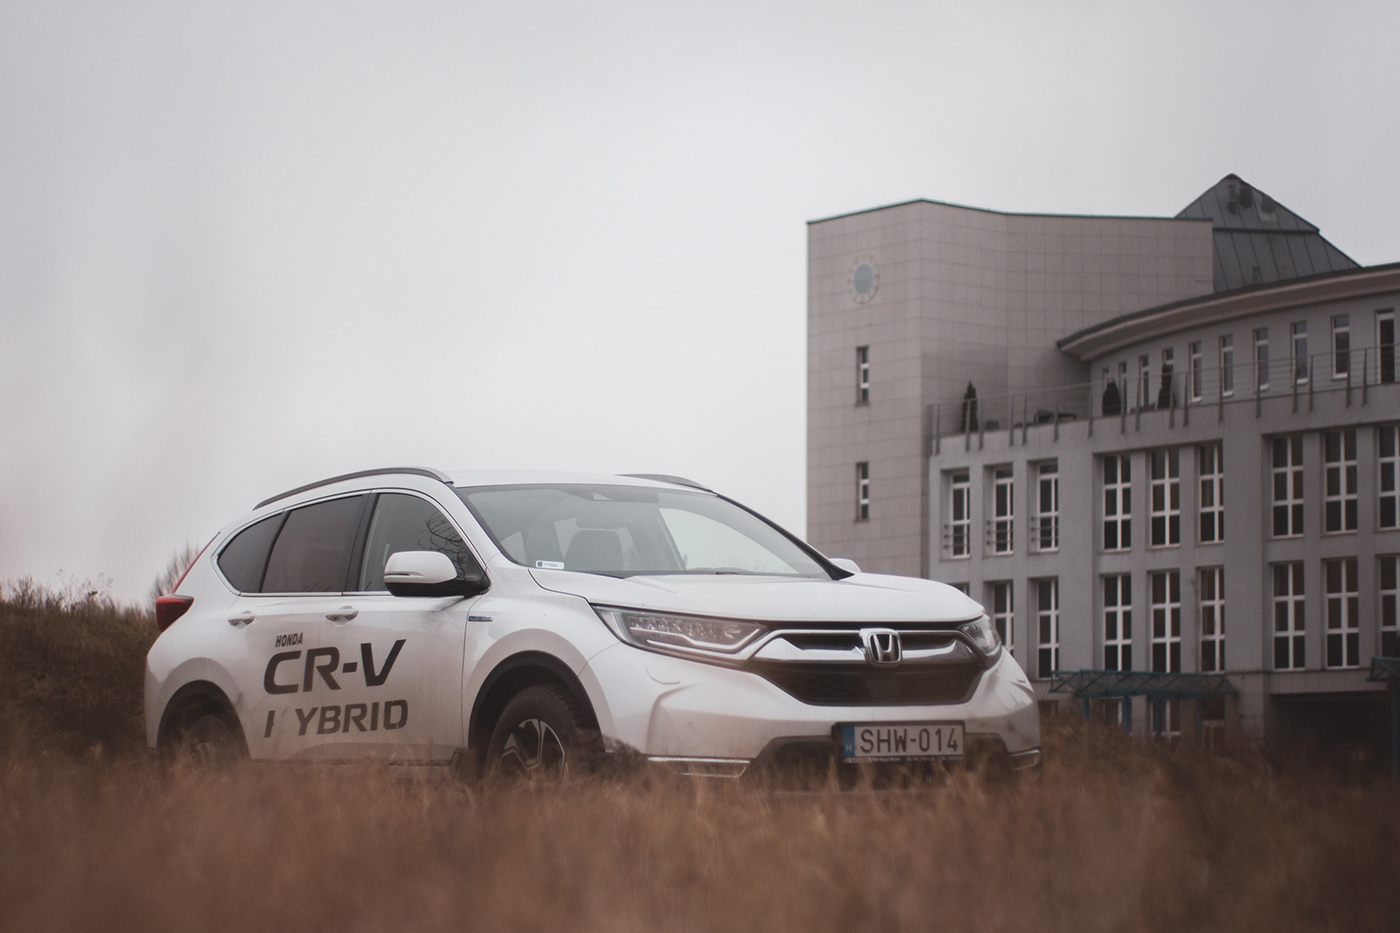 CarPhotoshoot cartesting fog foggy Honda hungary hybrid japan Photography  testcar